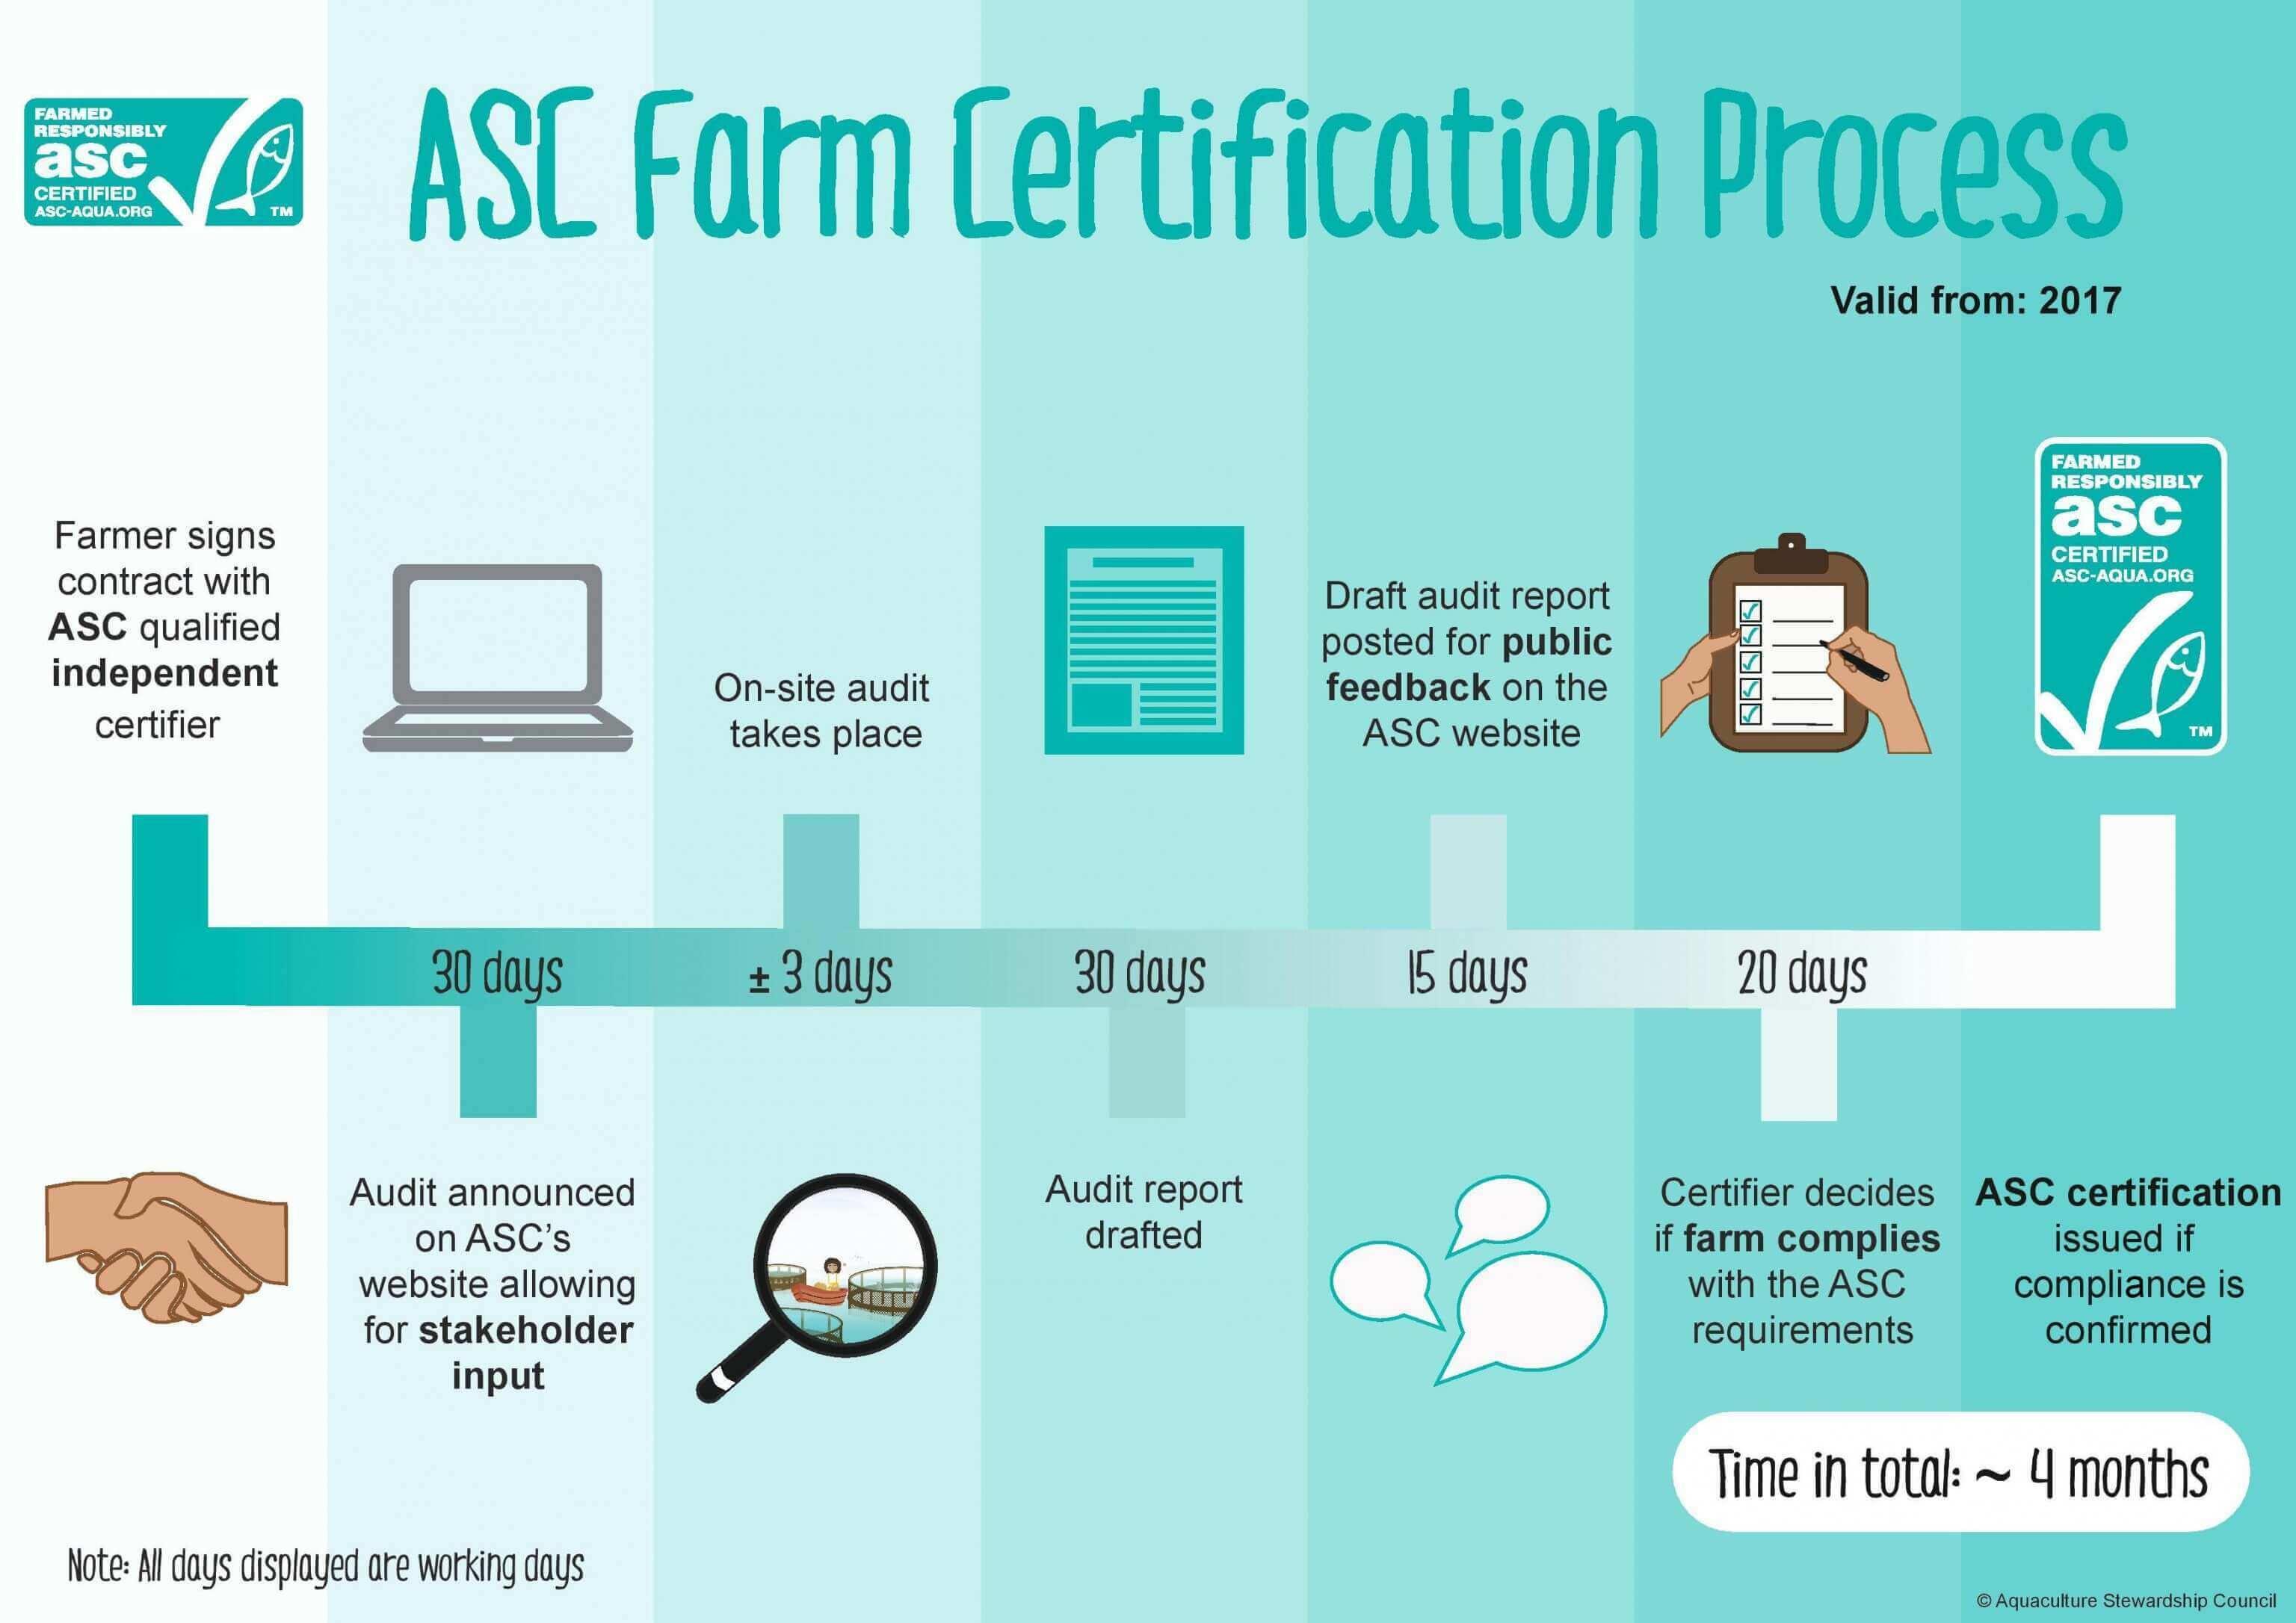 Asc Farm Certification Process